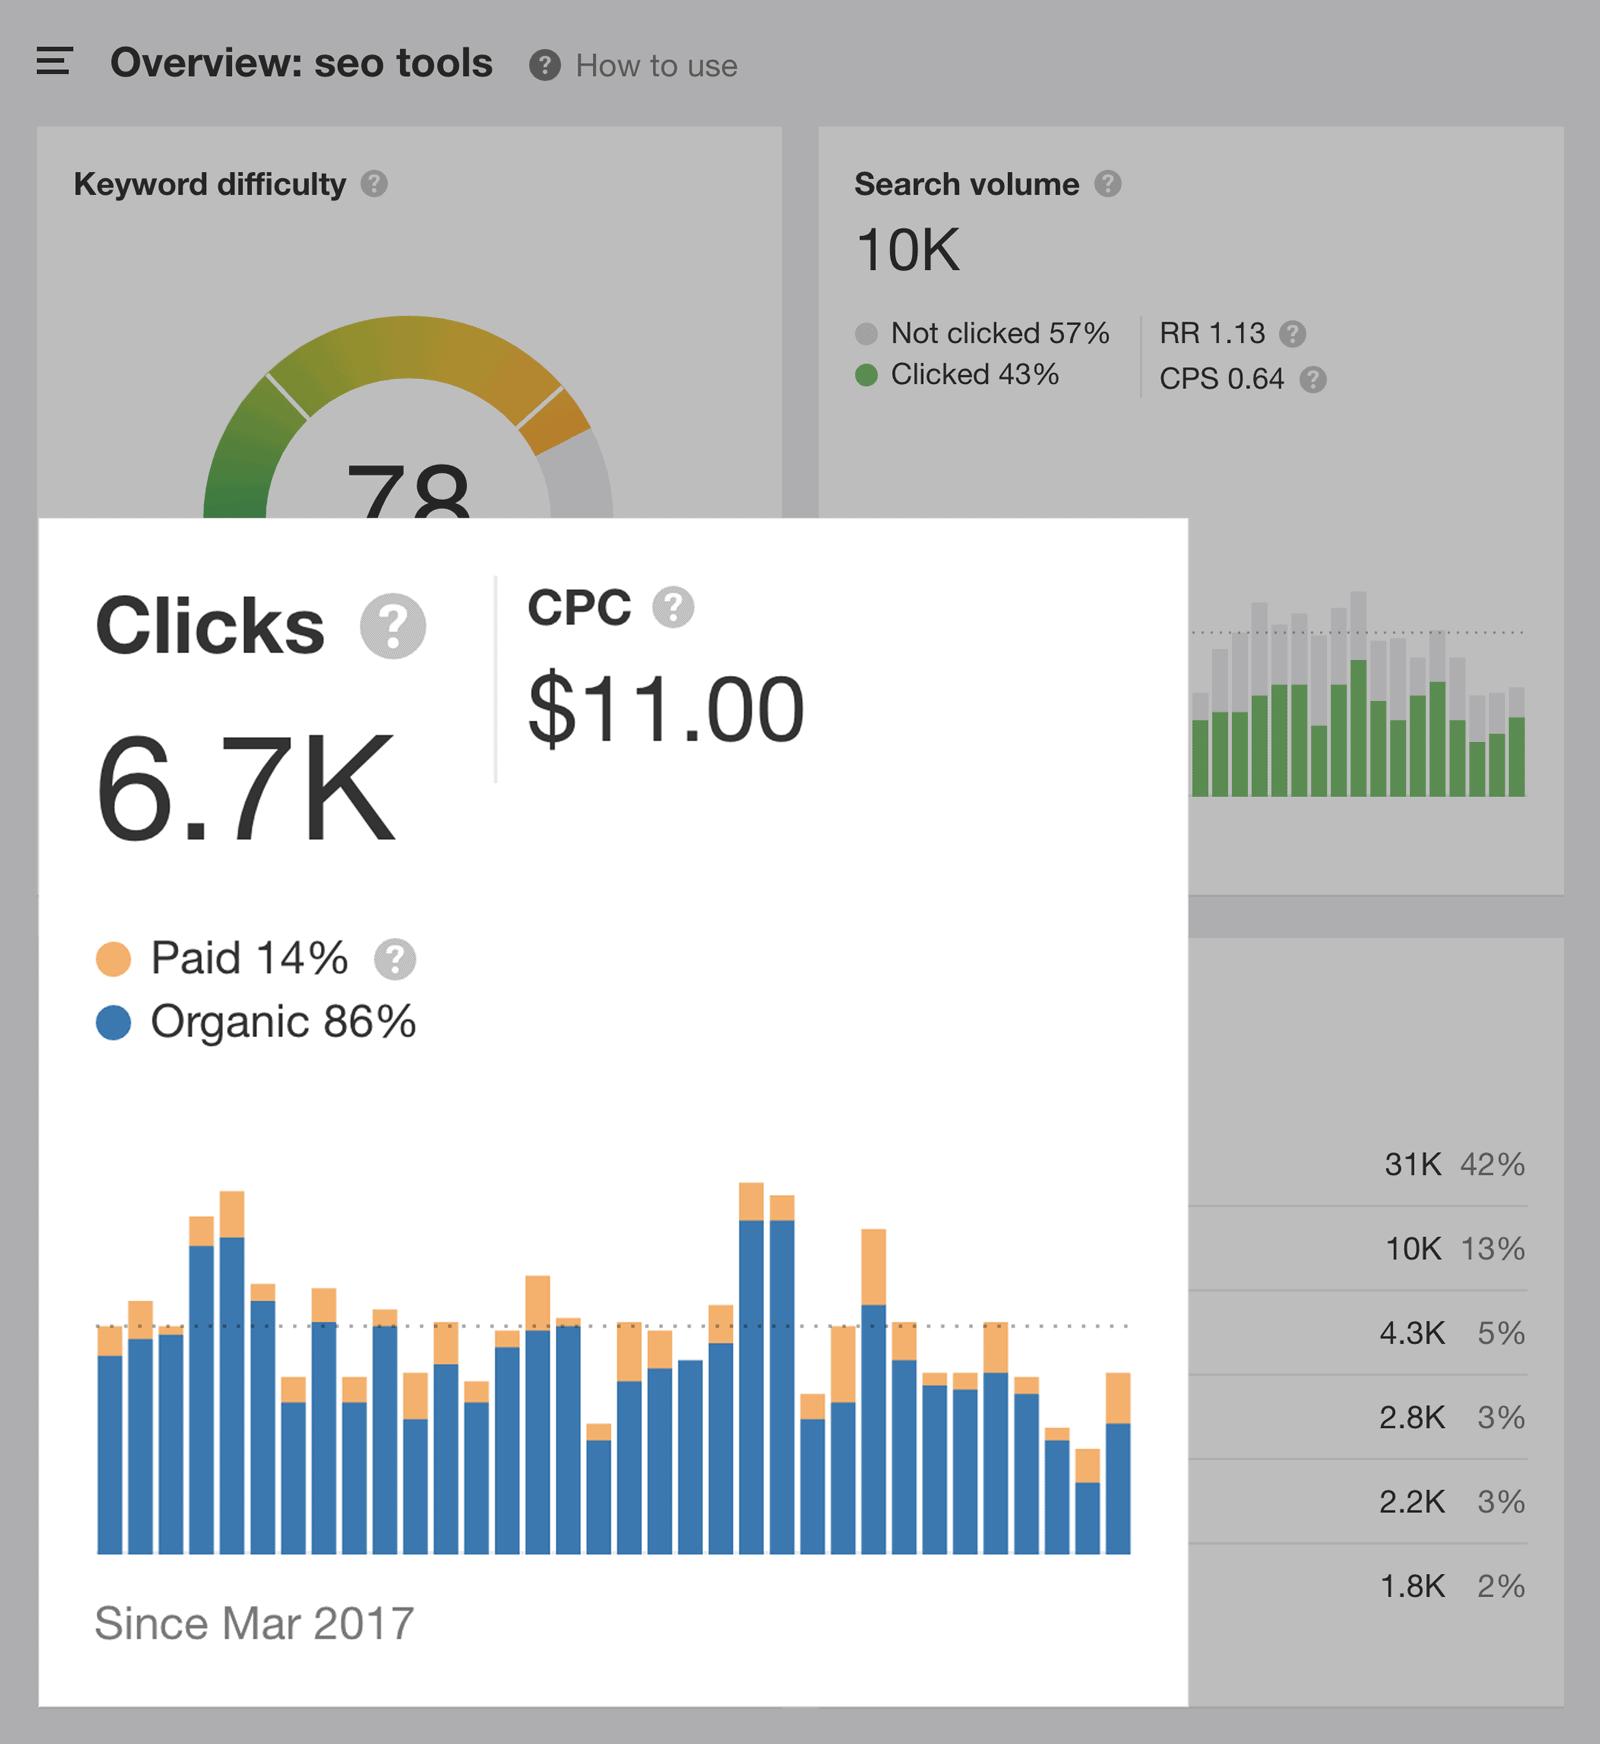 Ahrefs – Shows clicks